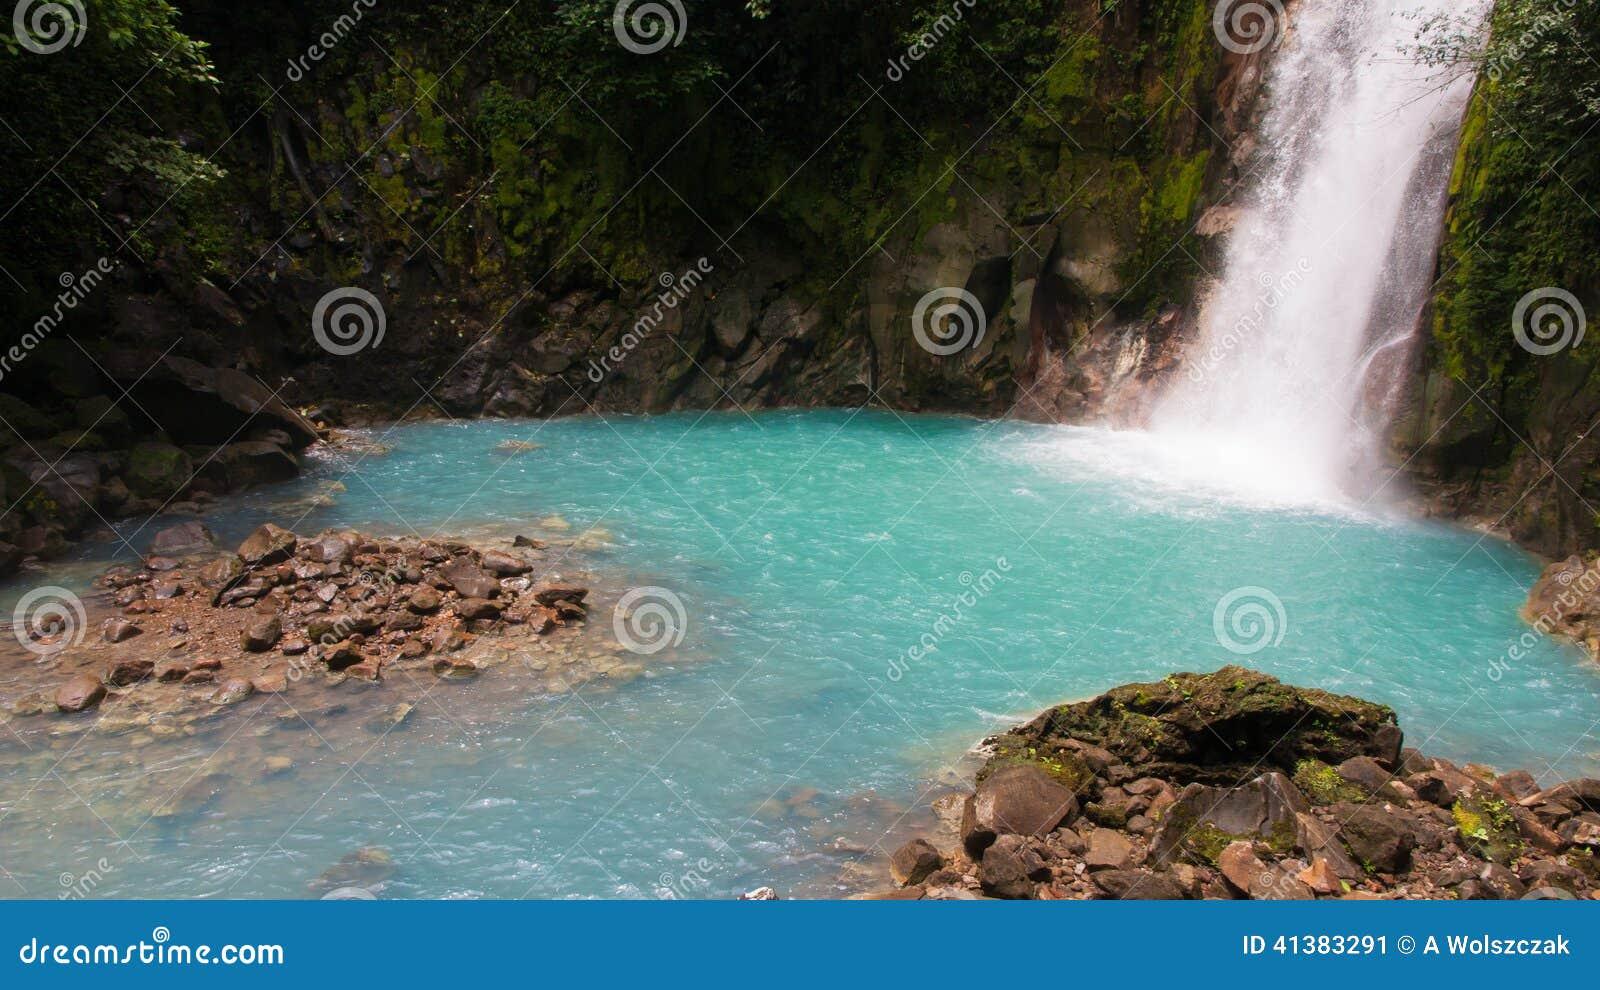 Rio Celeste River Waterfall